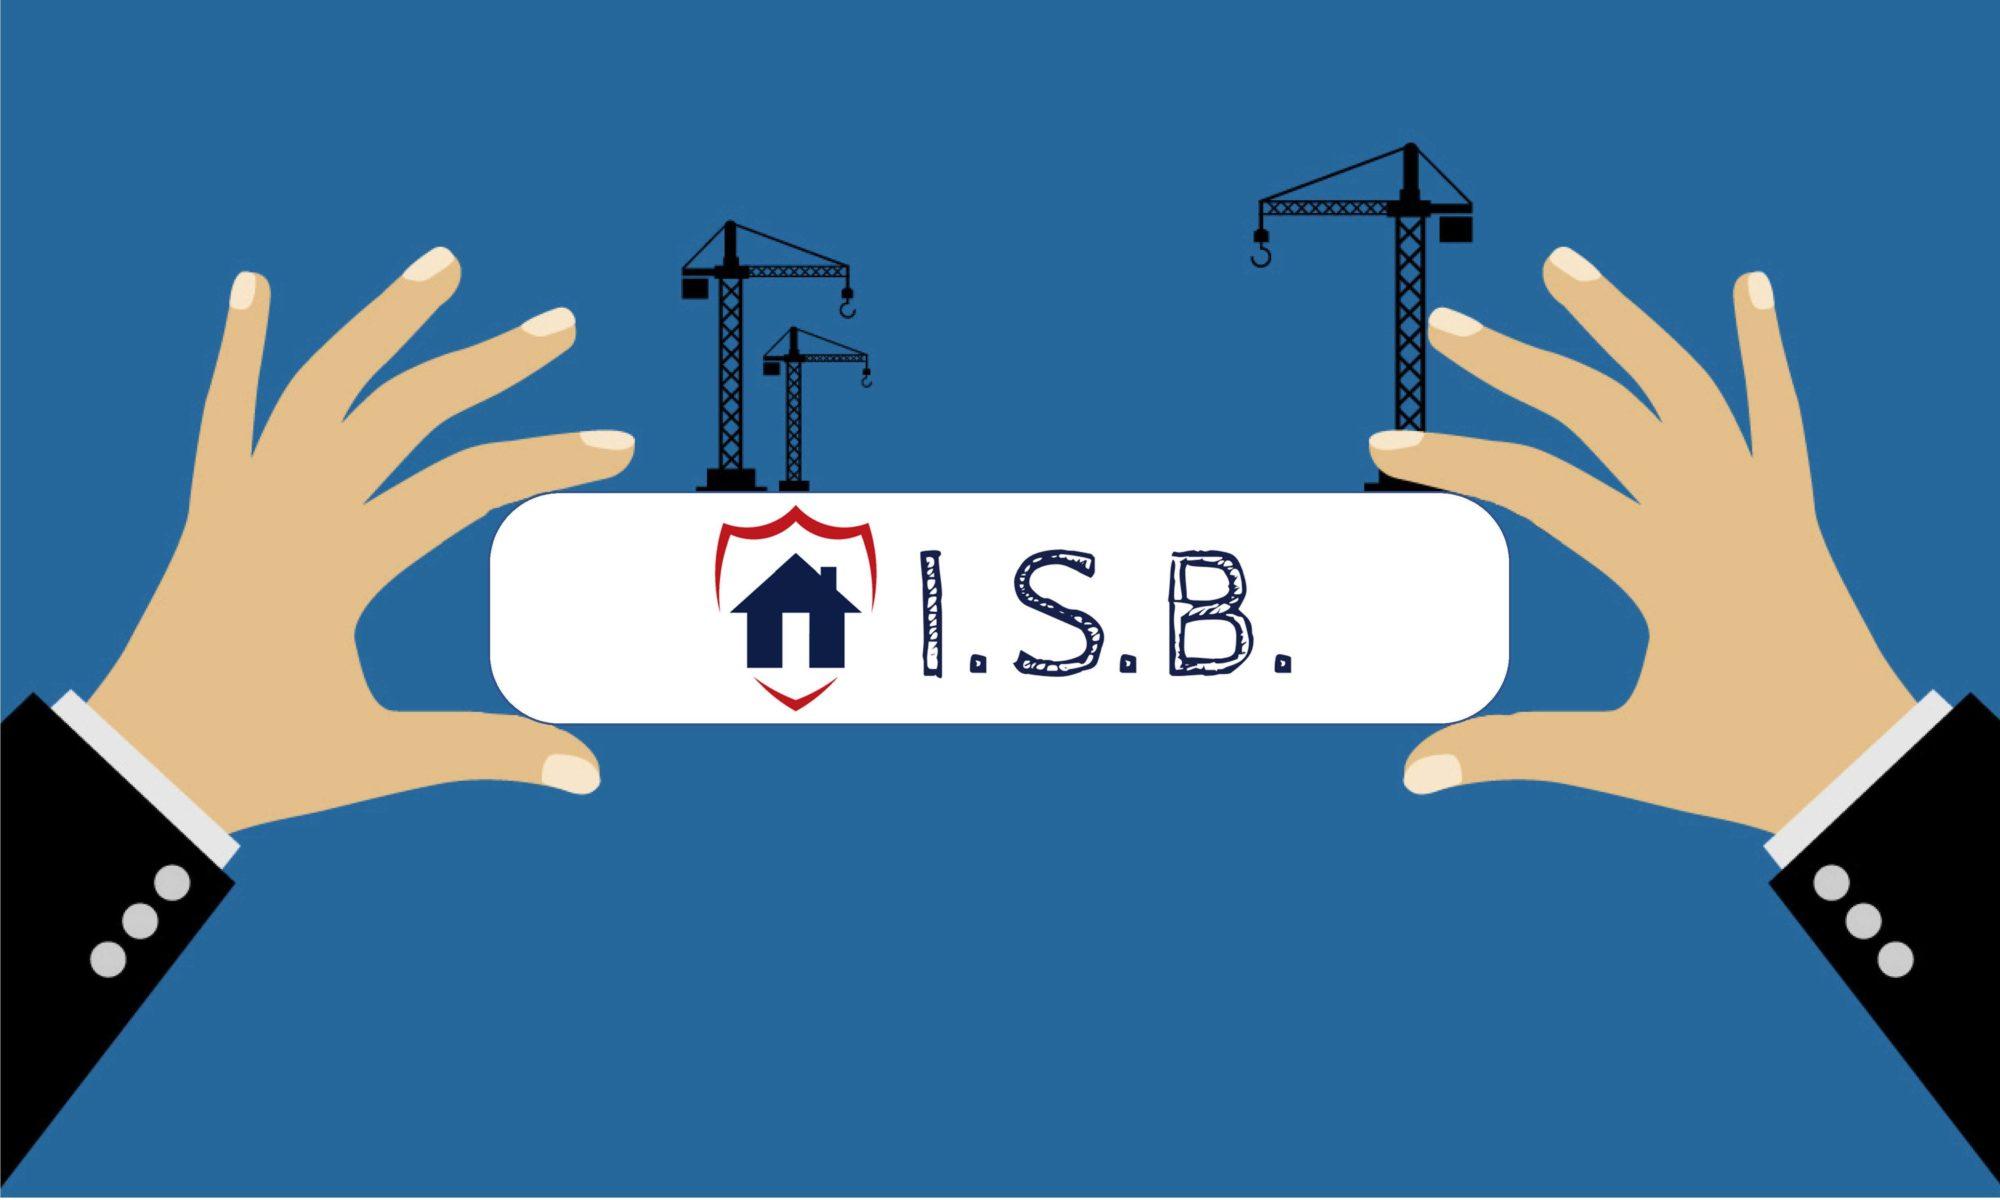 I.S.B.